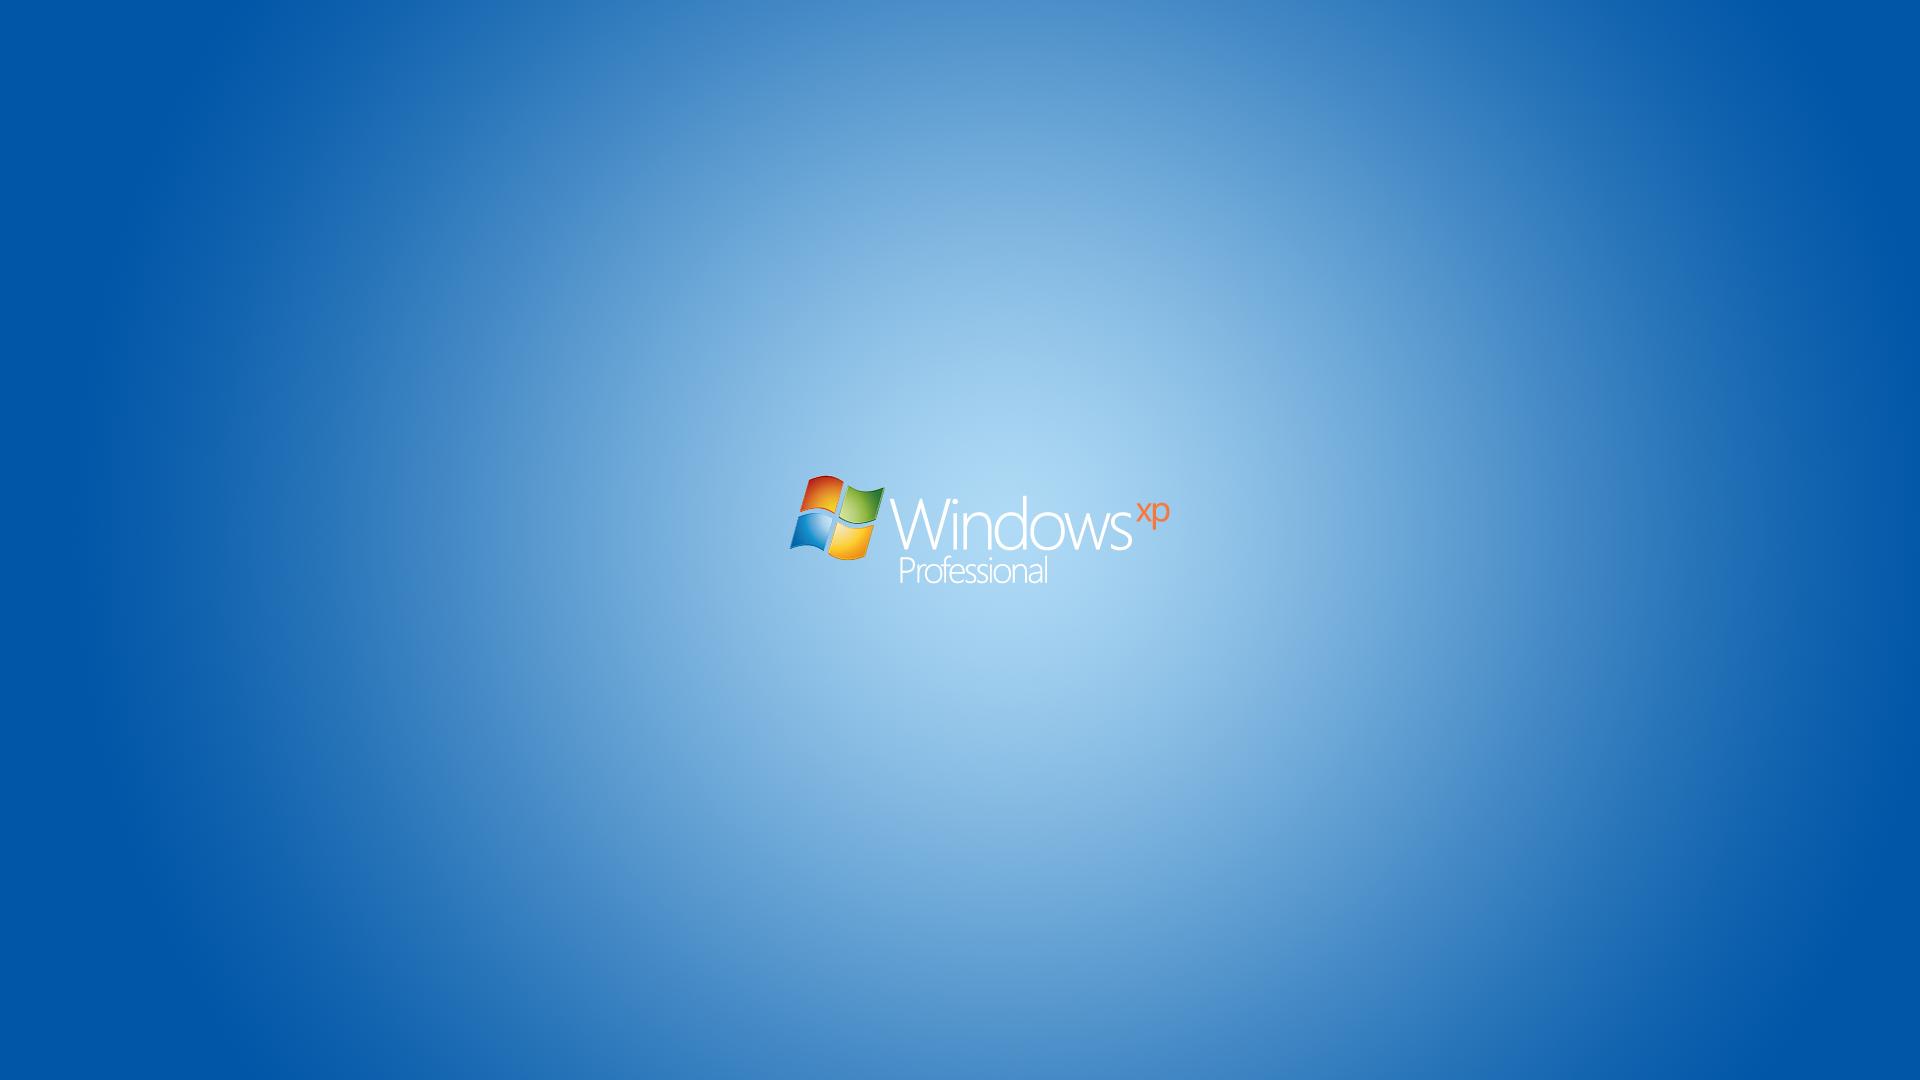 Download Windows XP Professional Wallpaper by Scimiazzurro